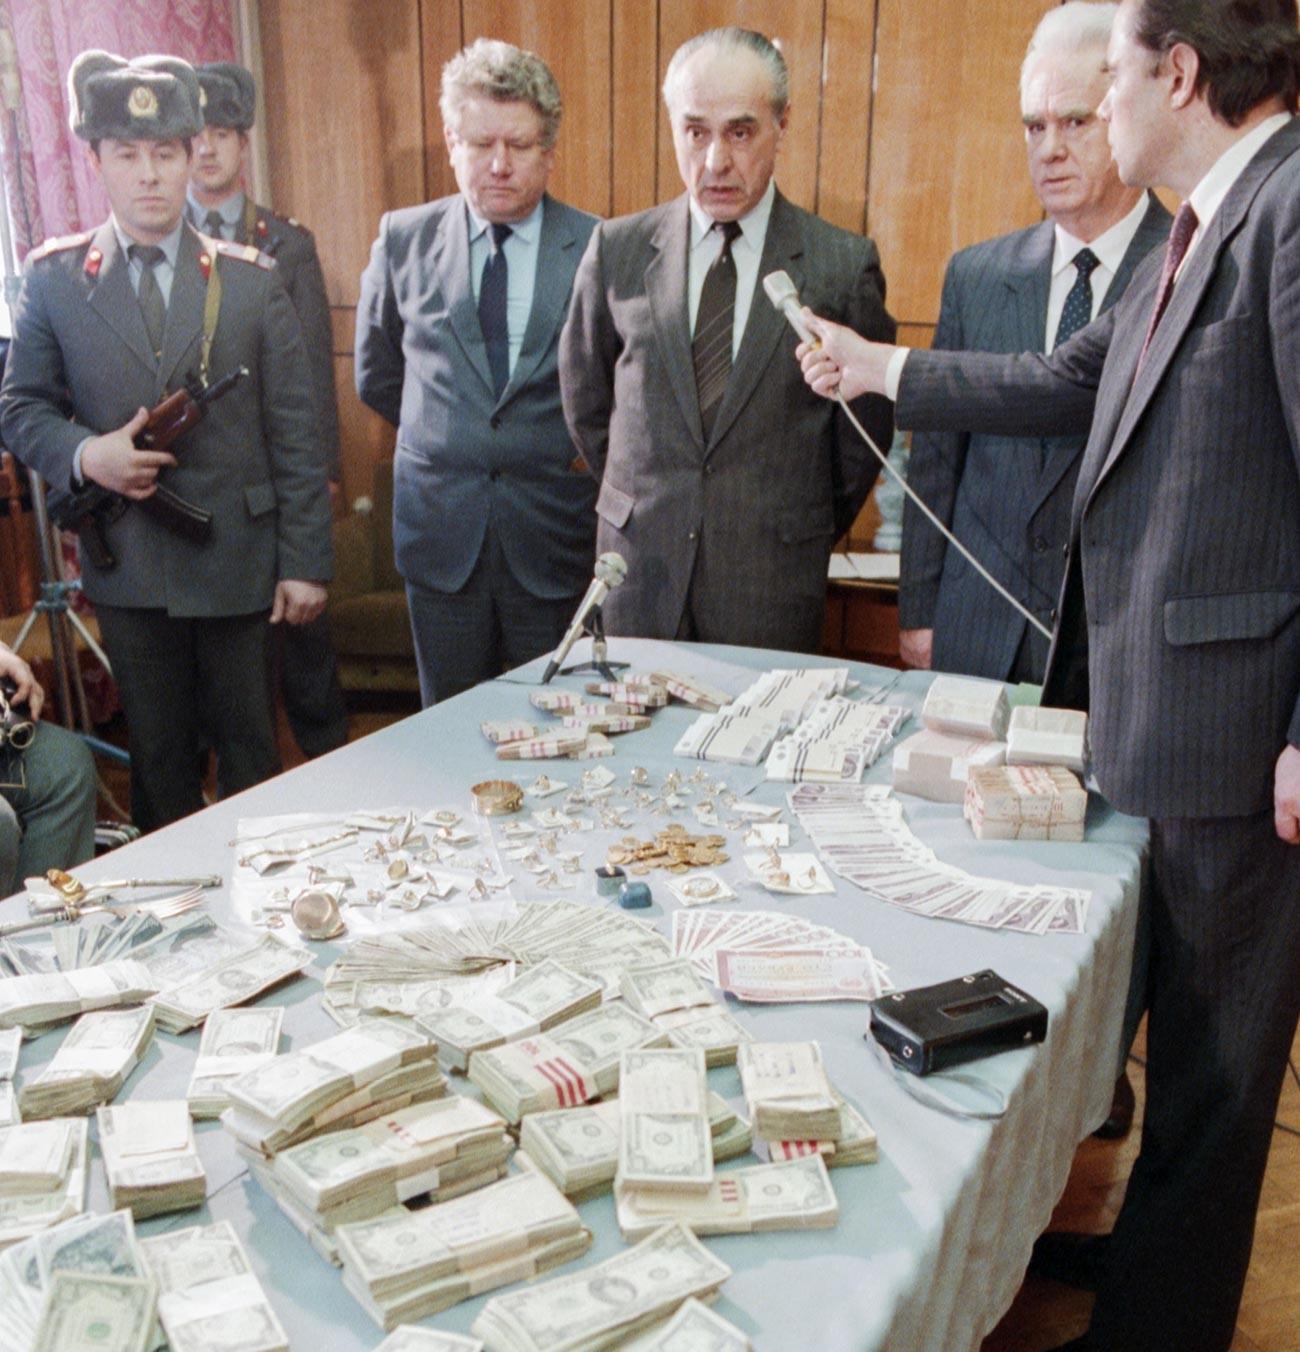 Operazione di confisca di valuta illegale